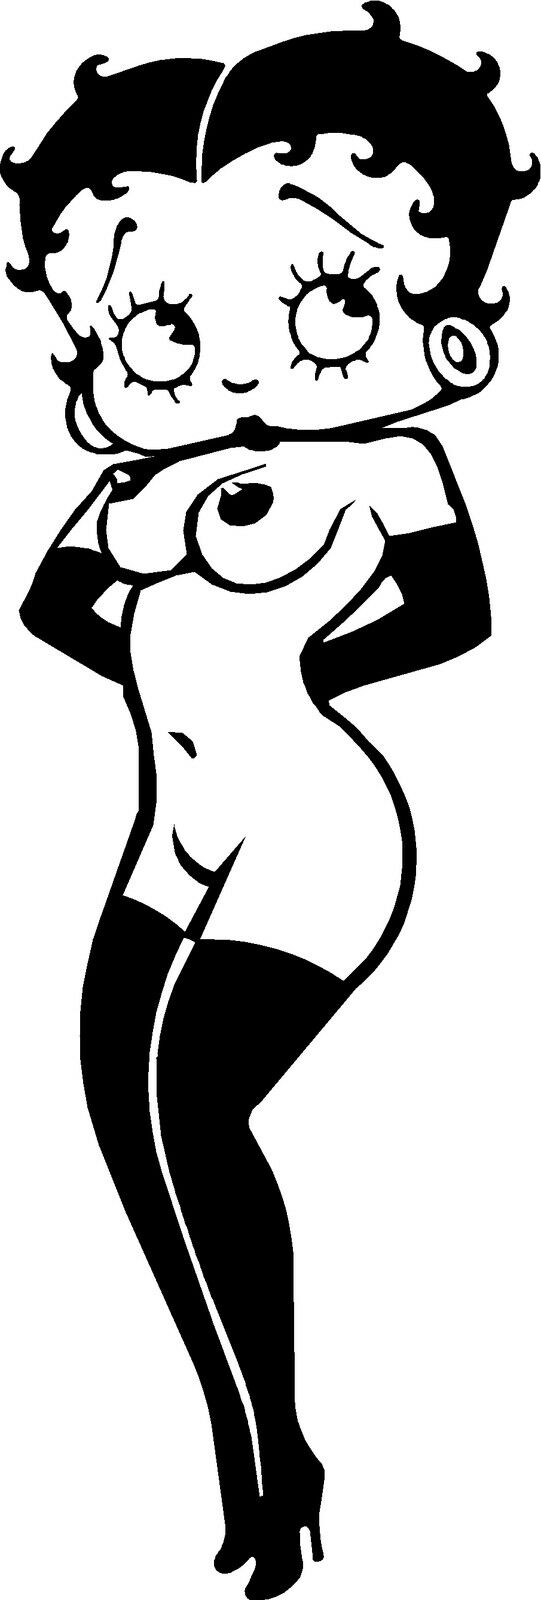 Betty boops big tits, vinyl cut decal